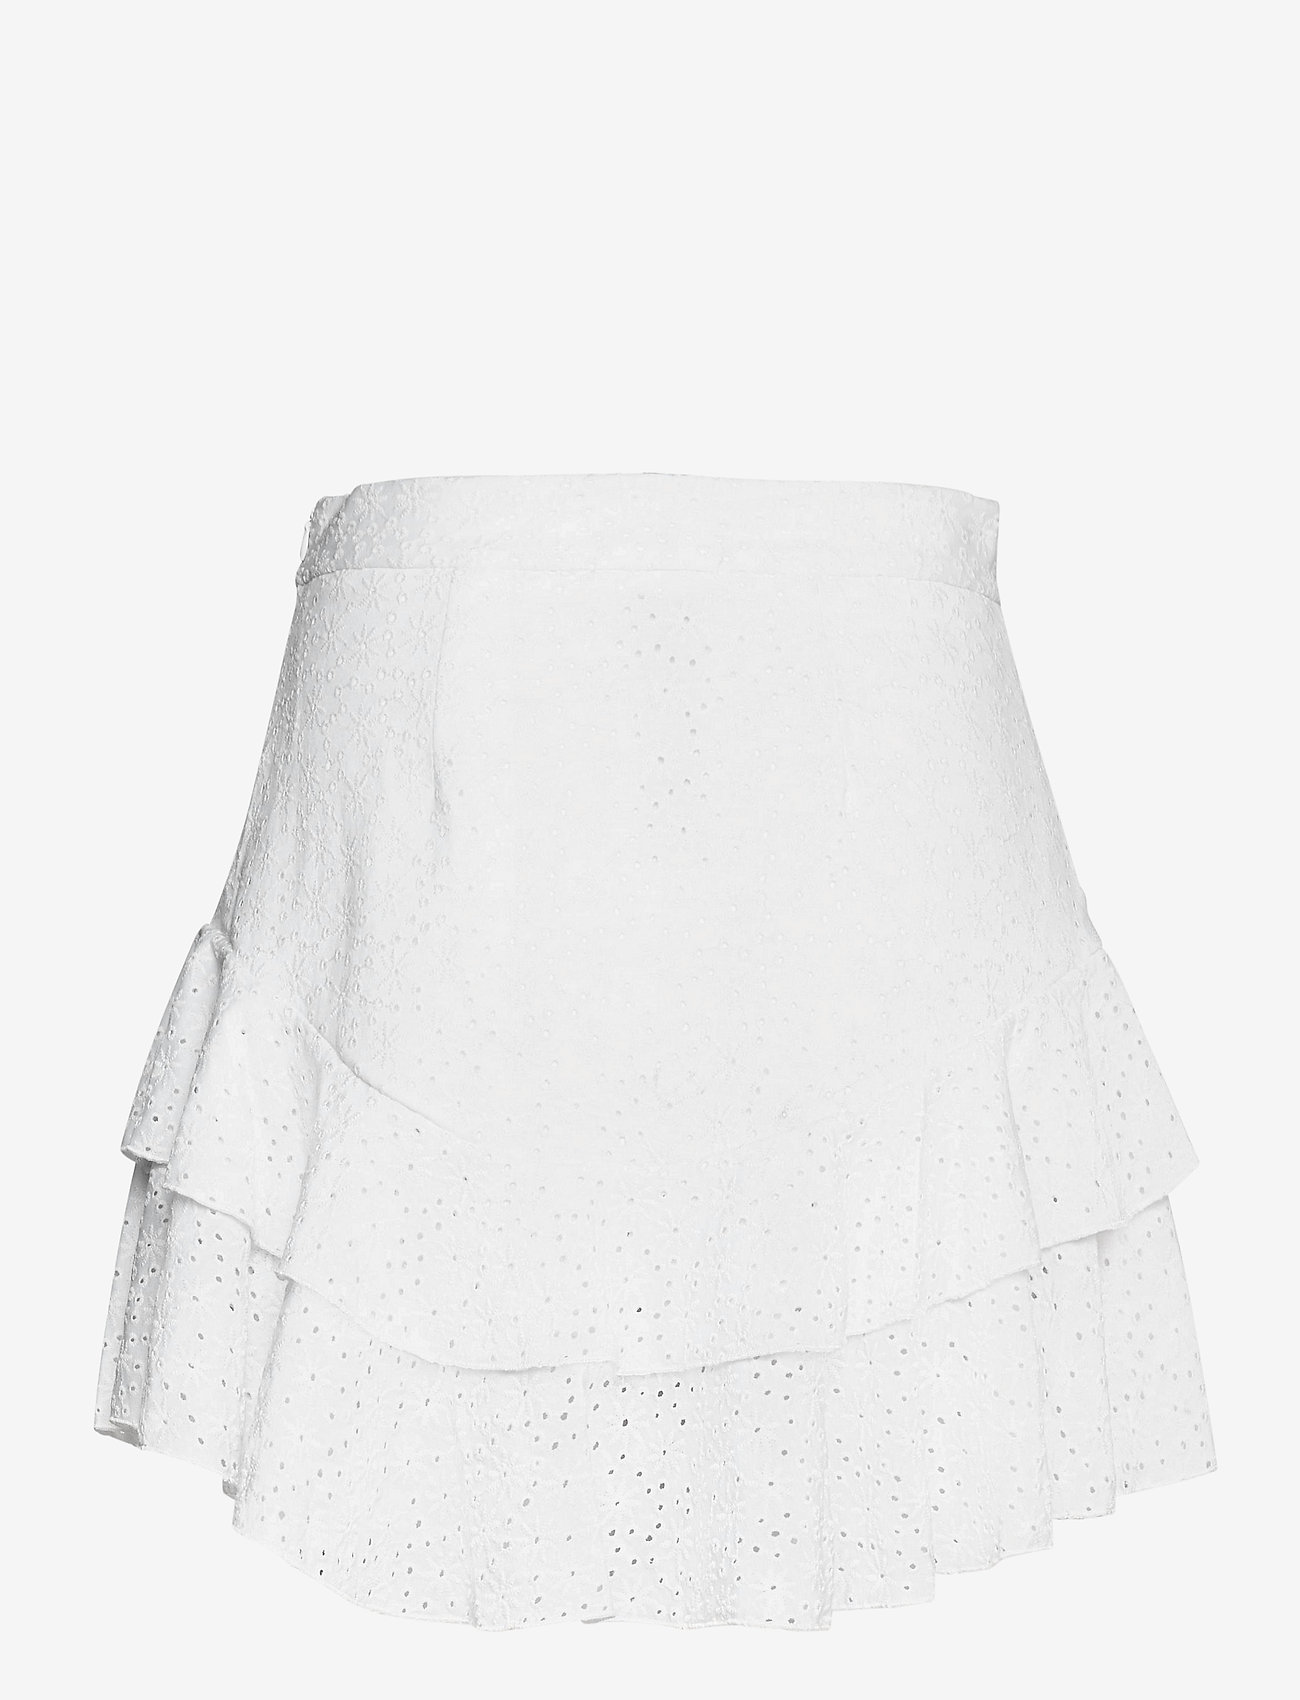 GUESS Jeans - TATIANA SKIRT - korta kjolar - true white a000 - 1